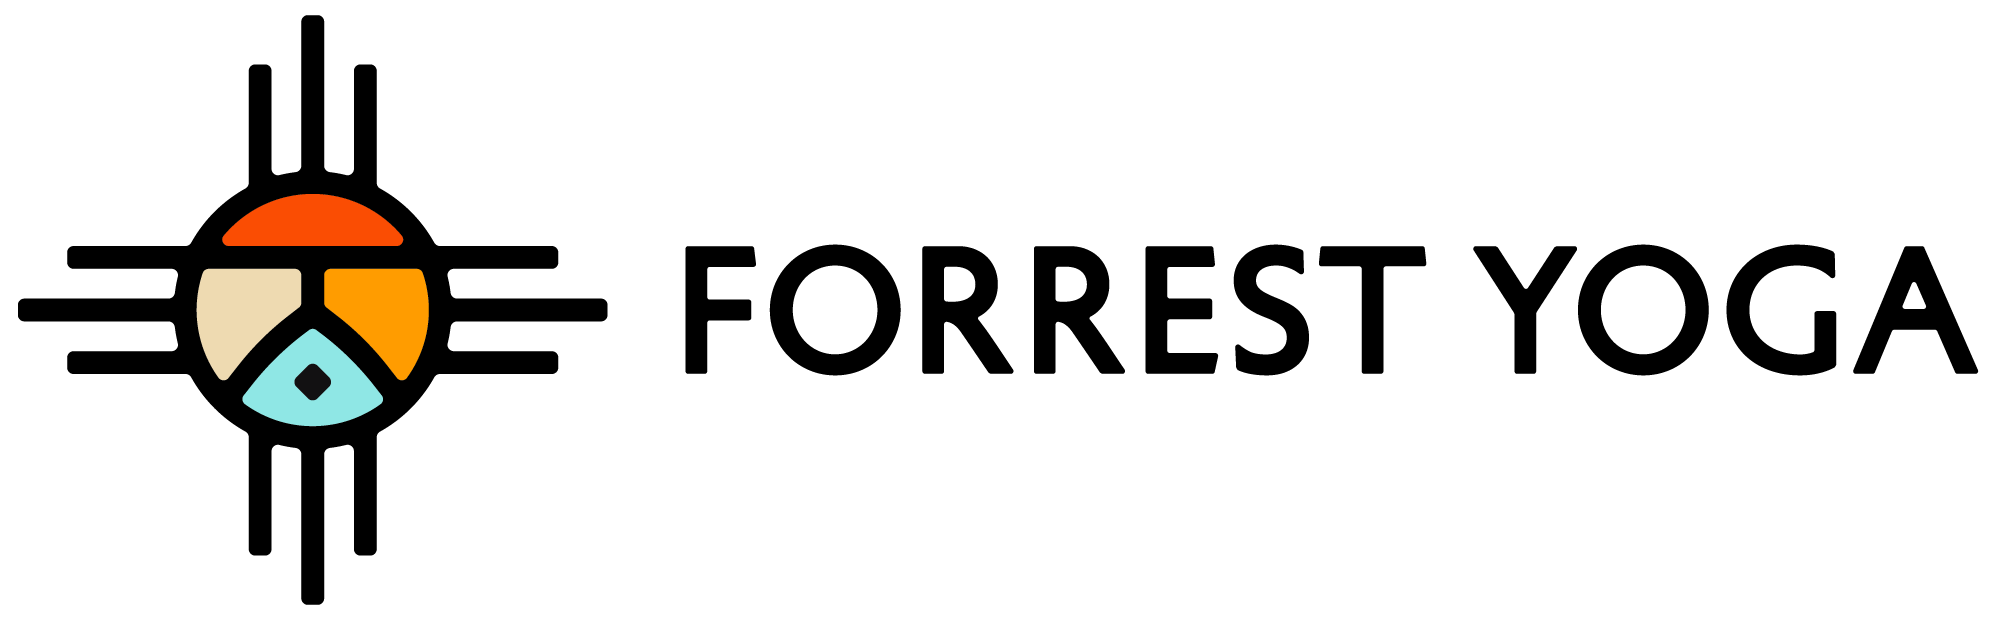 Forrest Yoga Logo 2019